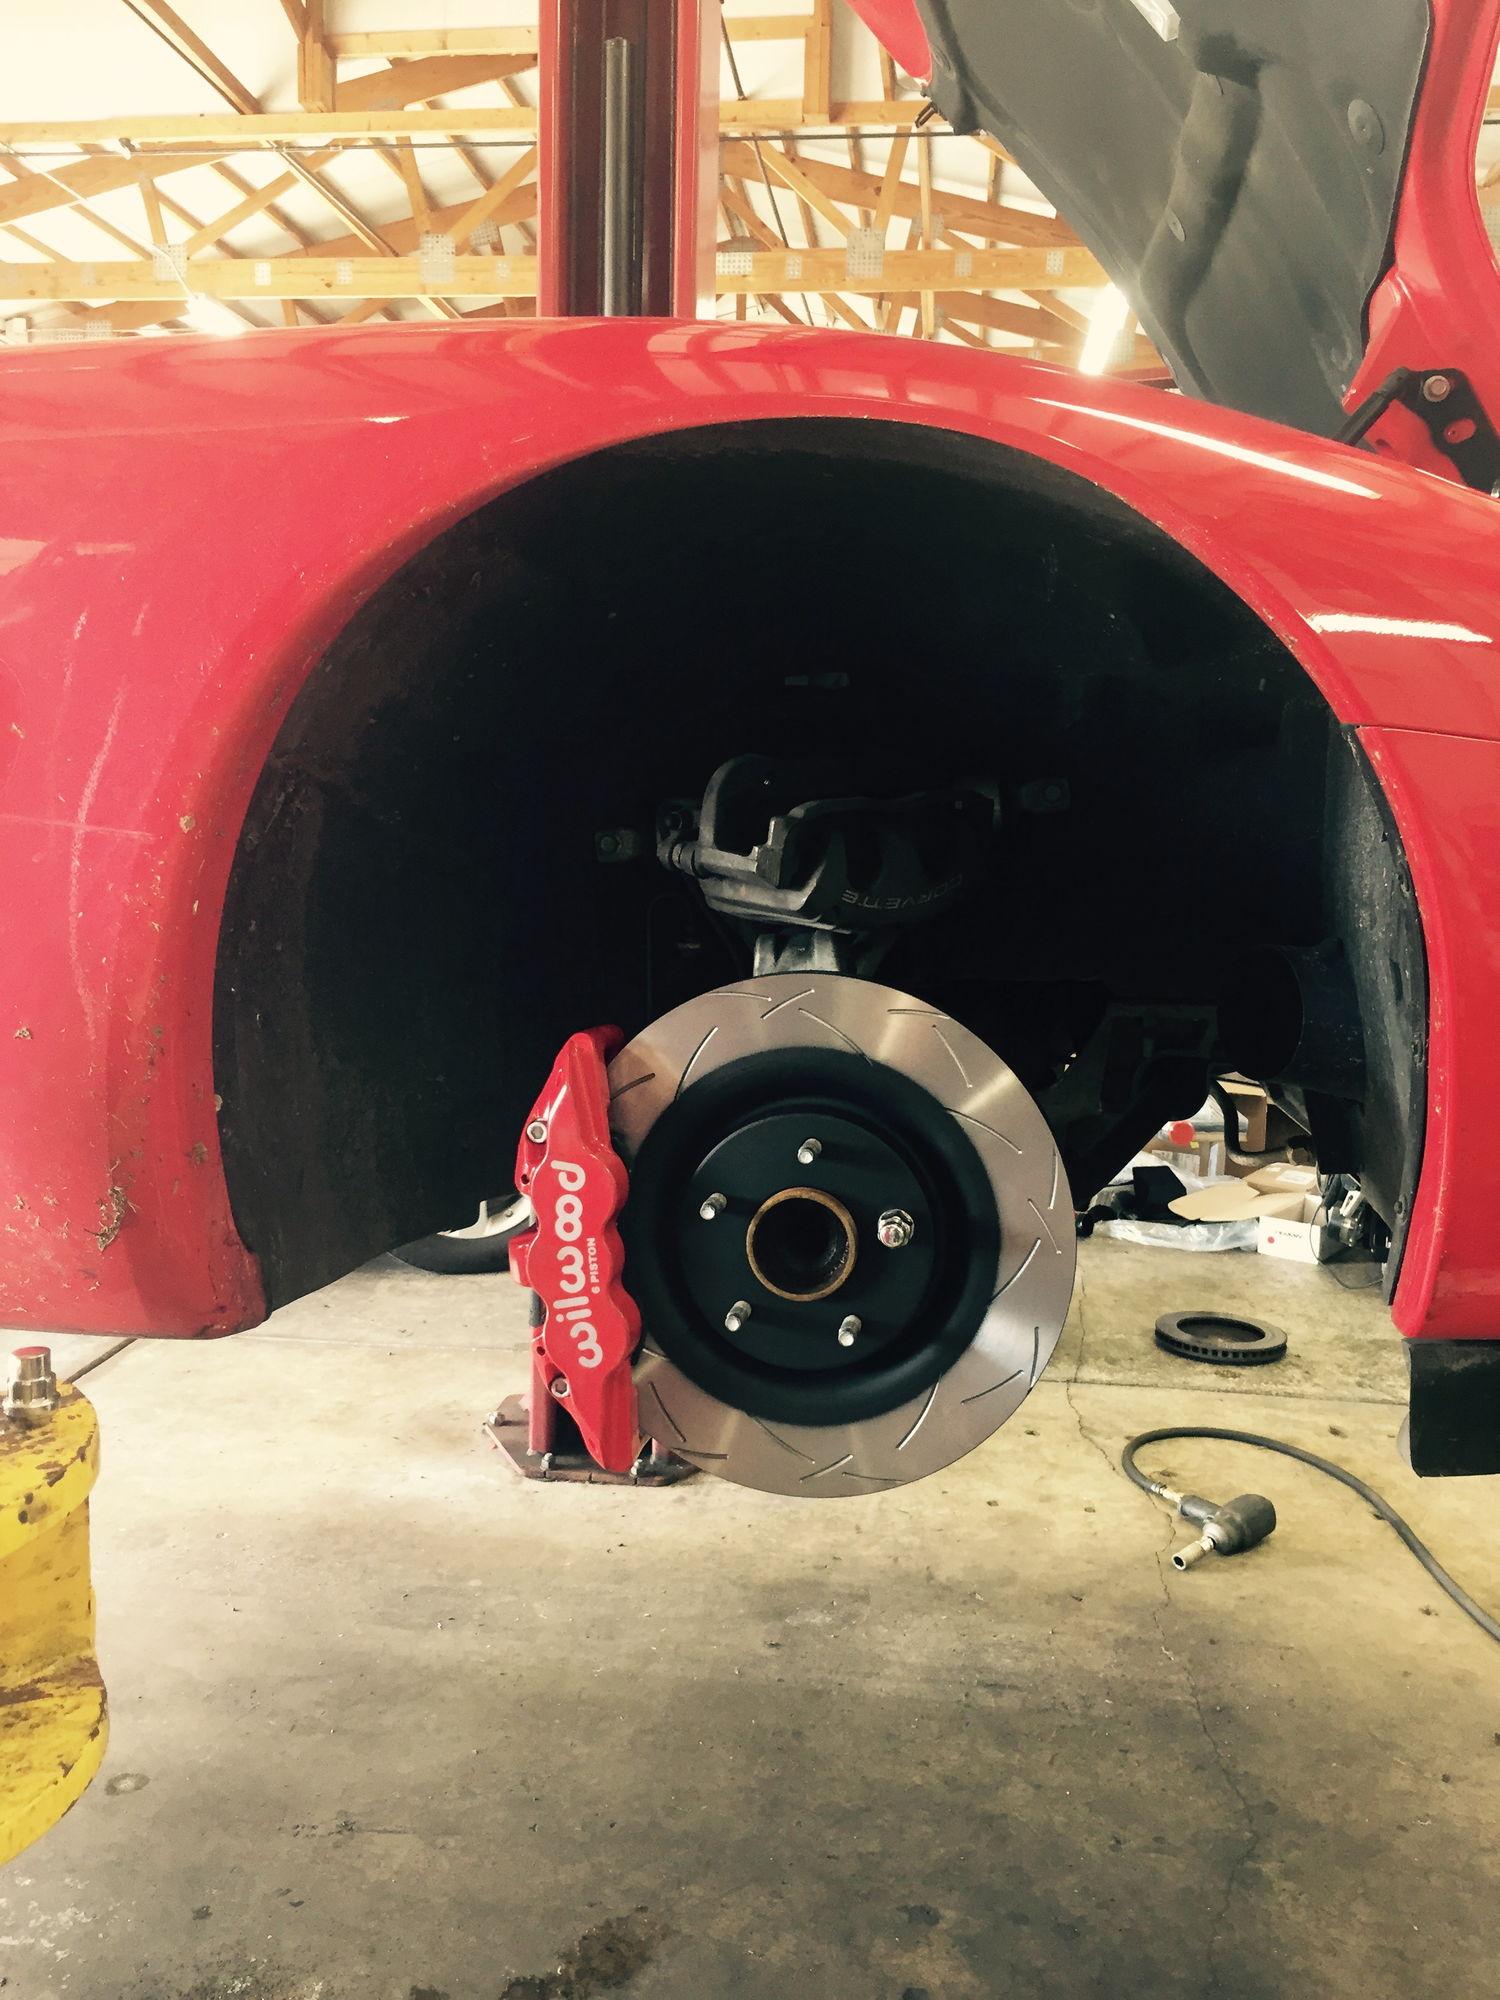 Hawk Brake Pads >> Wilwood Aero 6 brake kit - installed and review - CorvetteForum - Chevrolet Corvette Forum ...